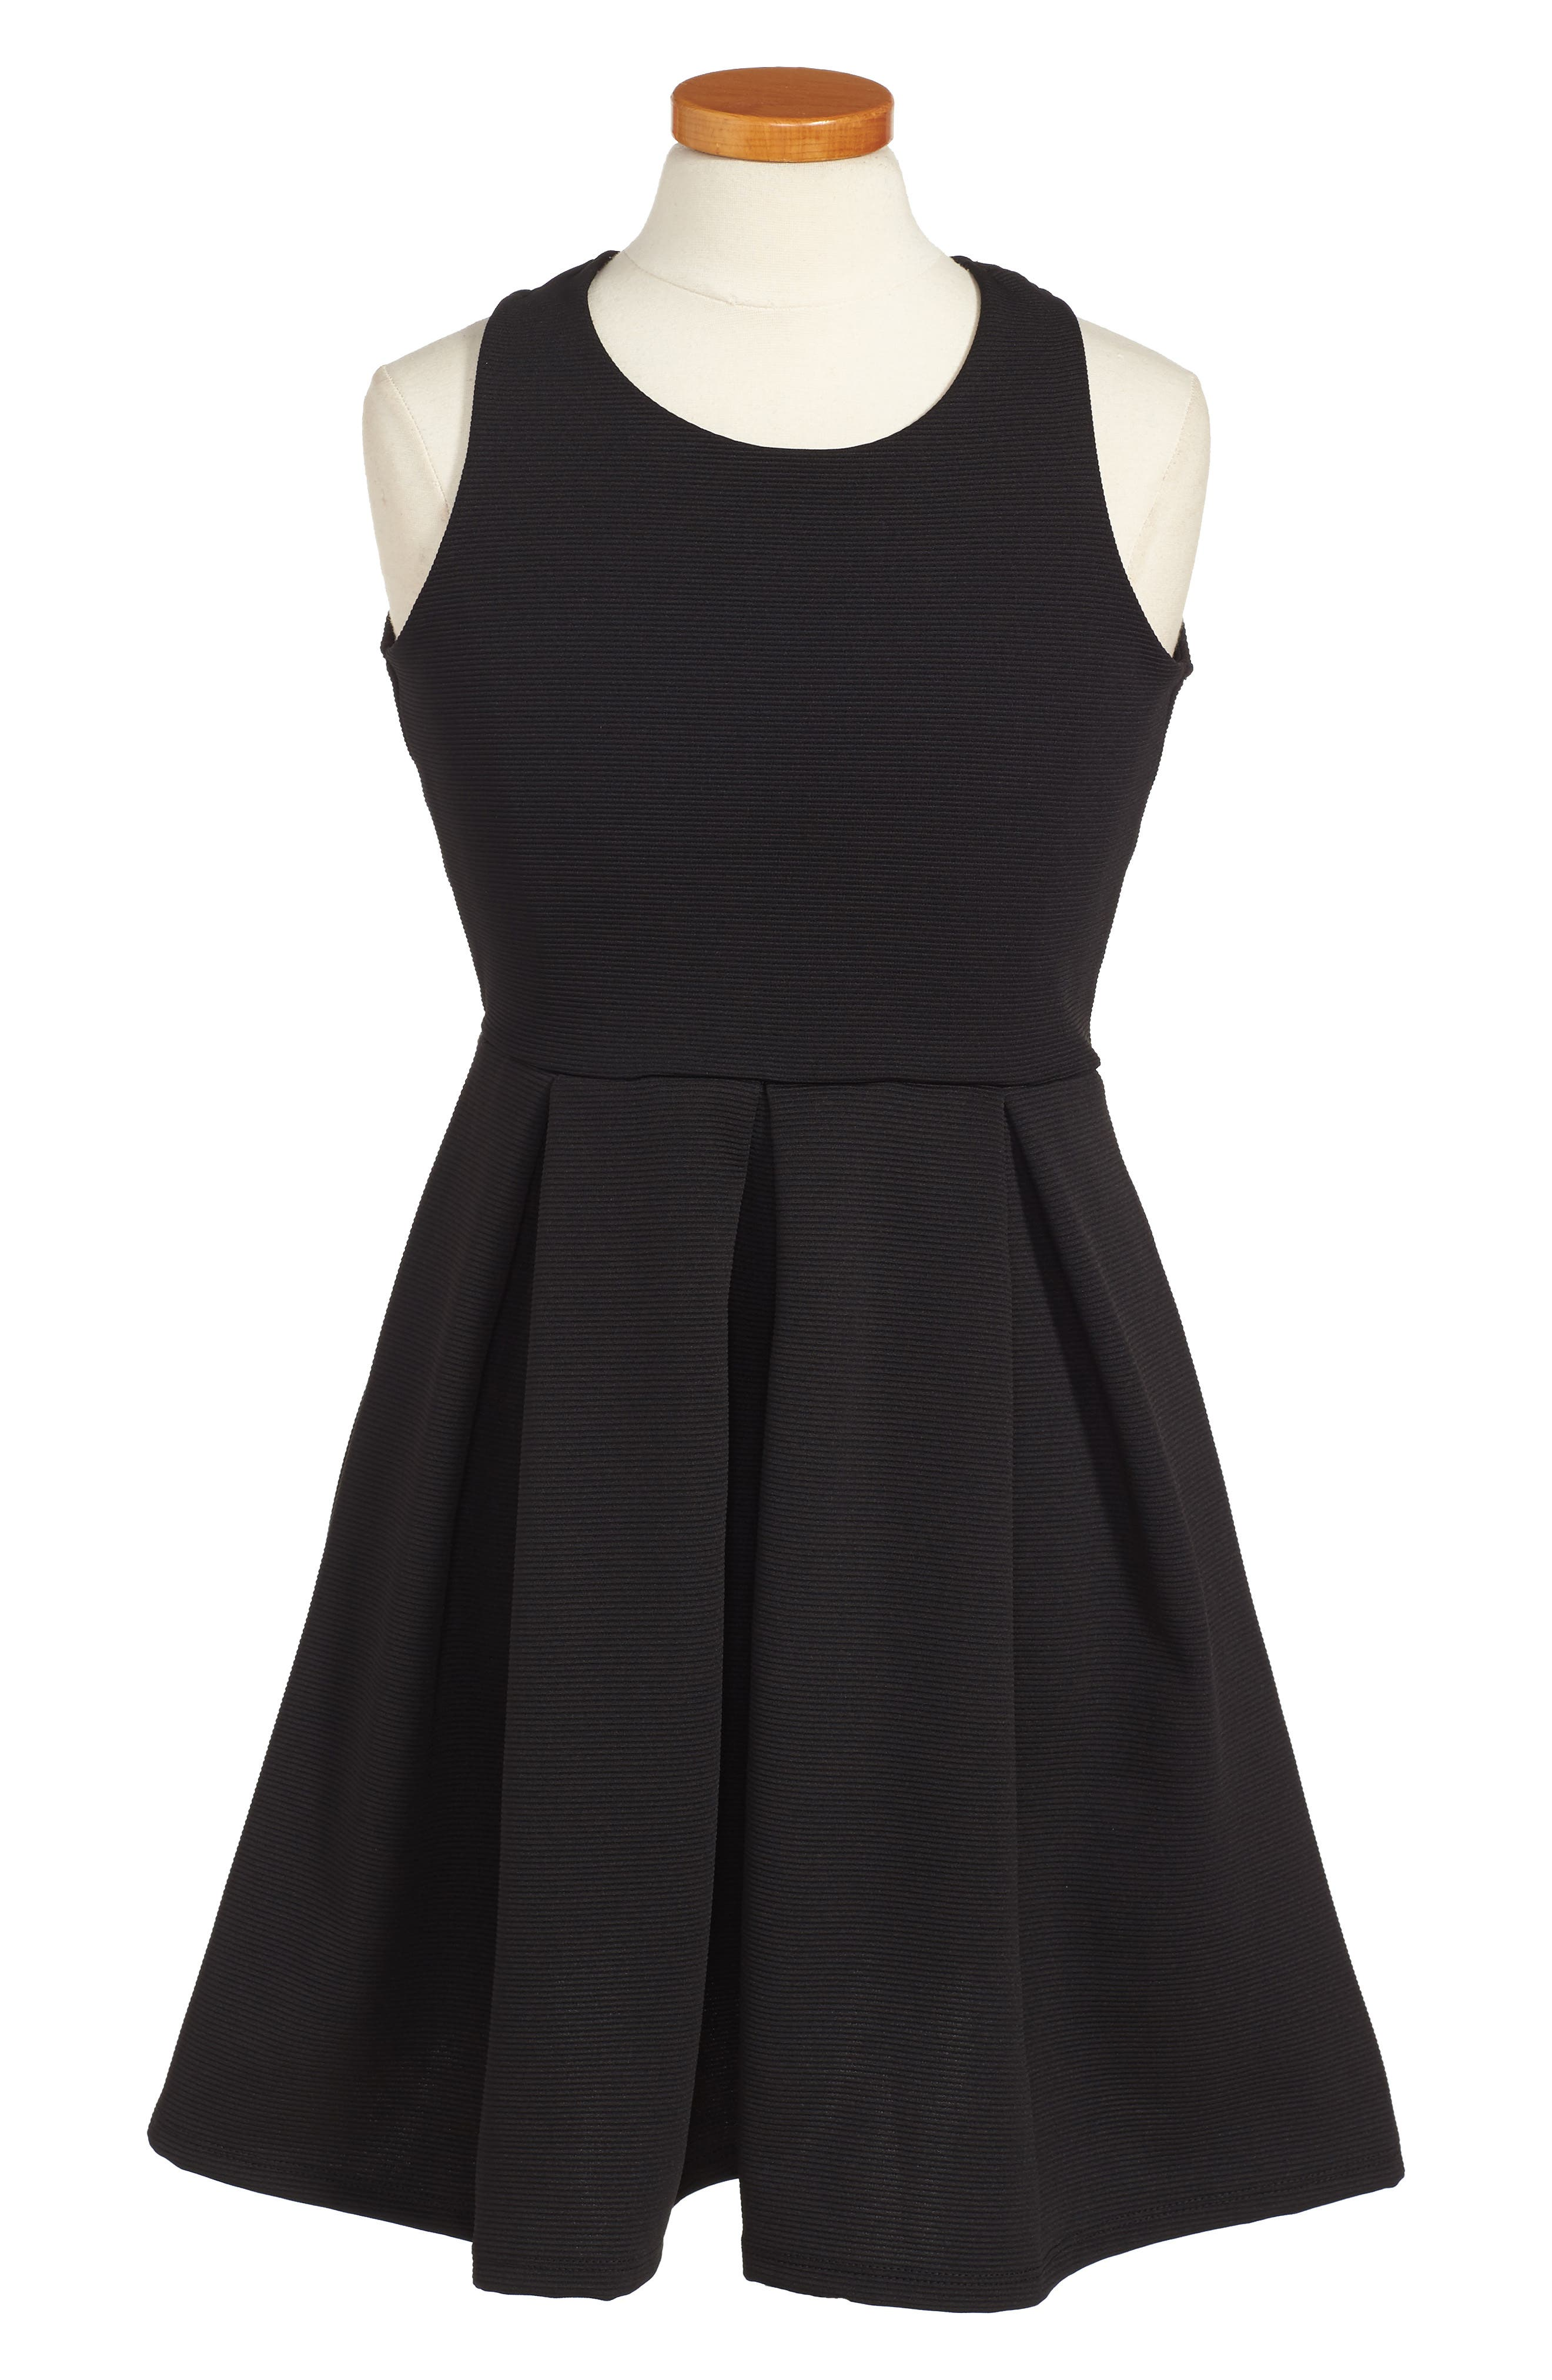 SOPRANO,                             Skater Dress,                             Alternate thumbnail 3, color,                             002